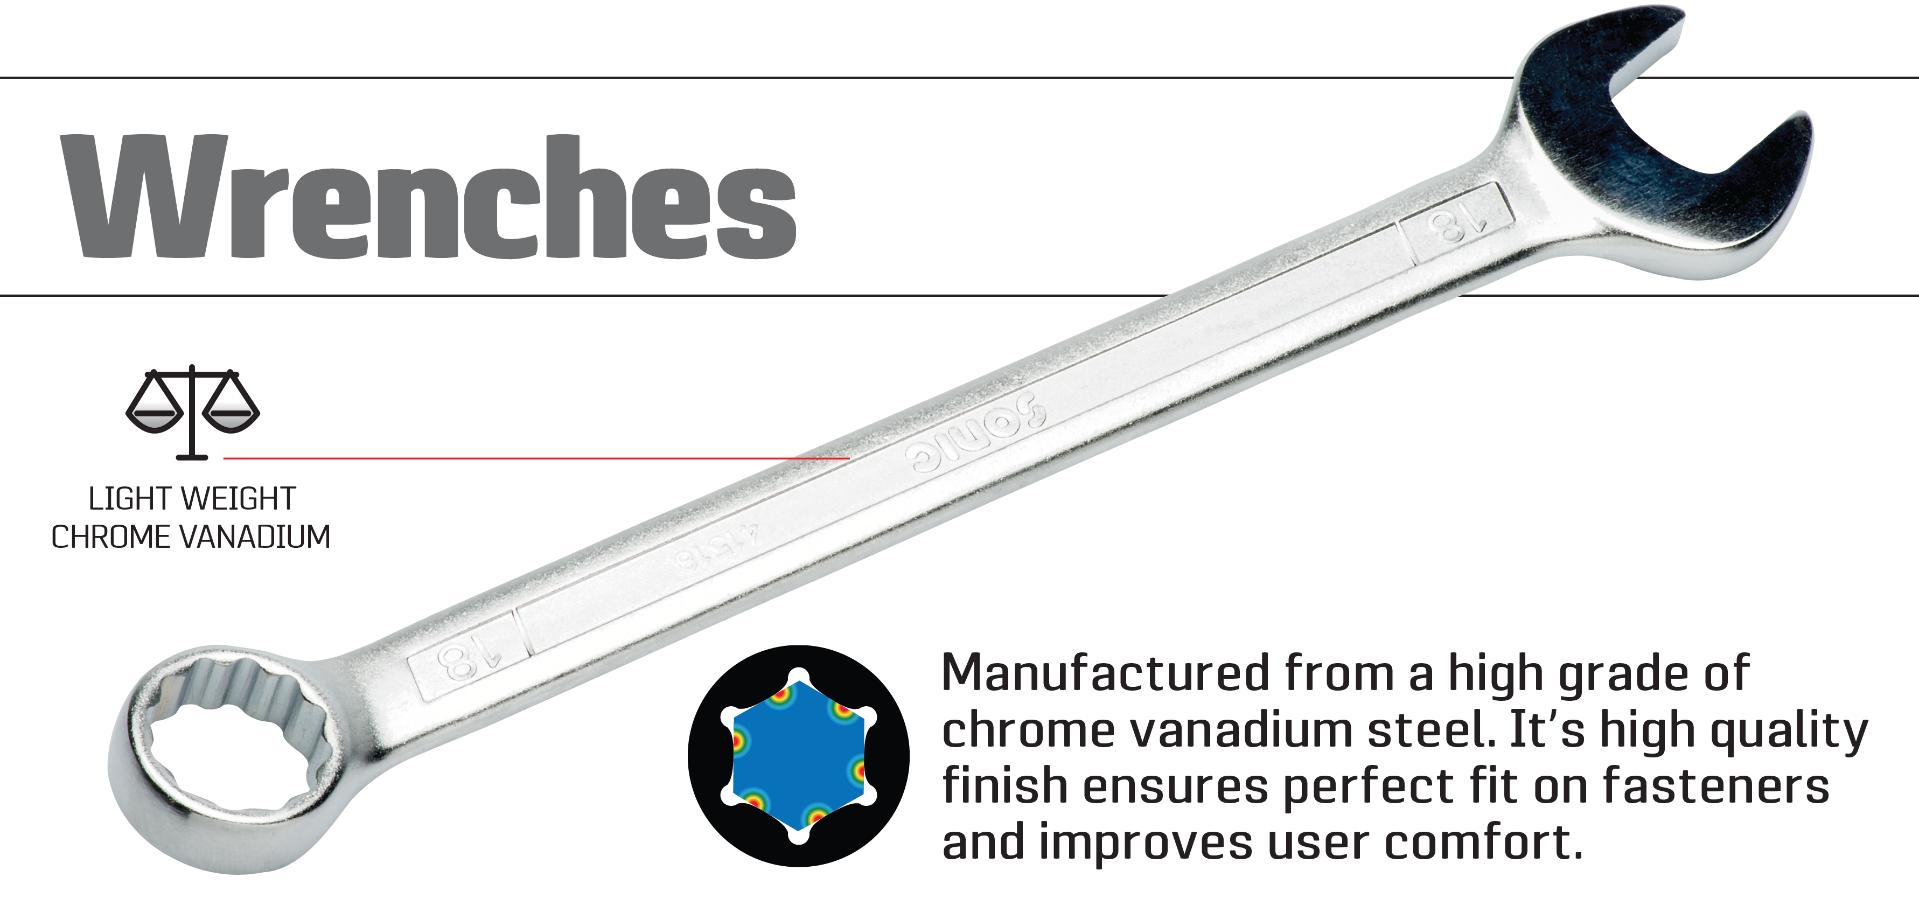 Sonic Wrenches made from high grade chrome vanadium steel